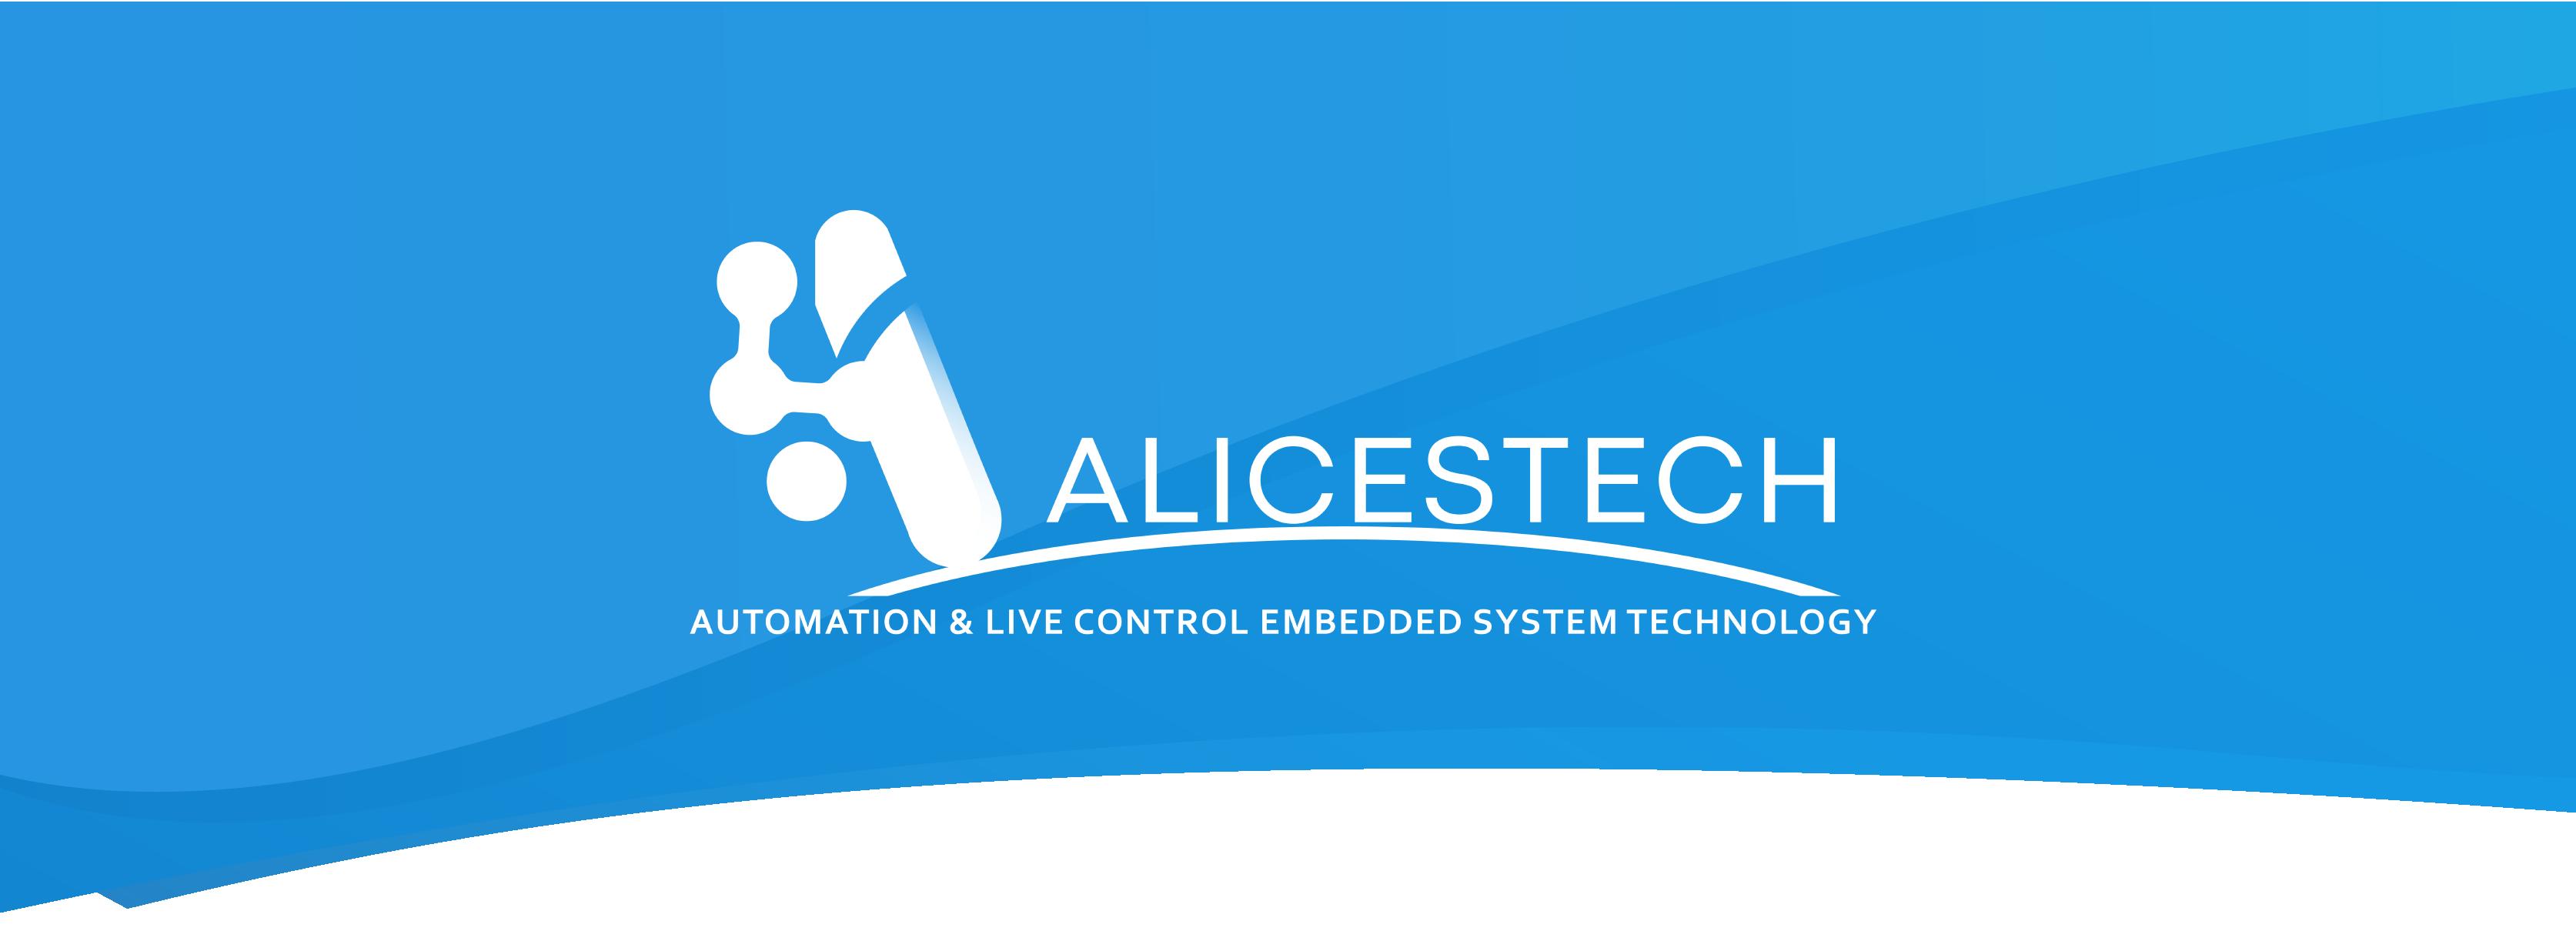 Alicestech